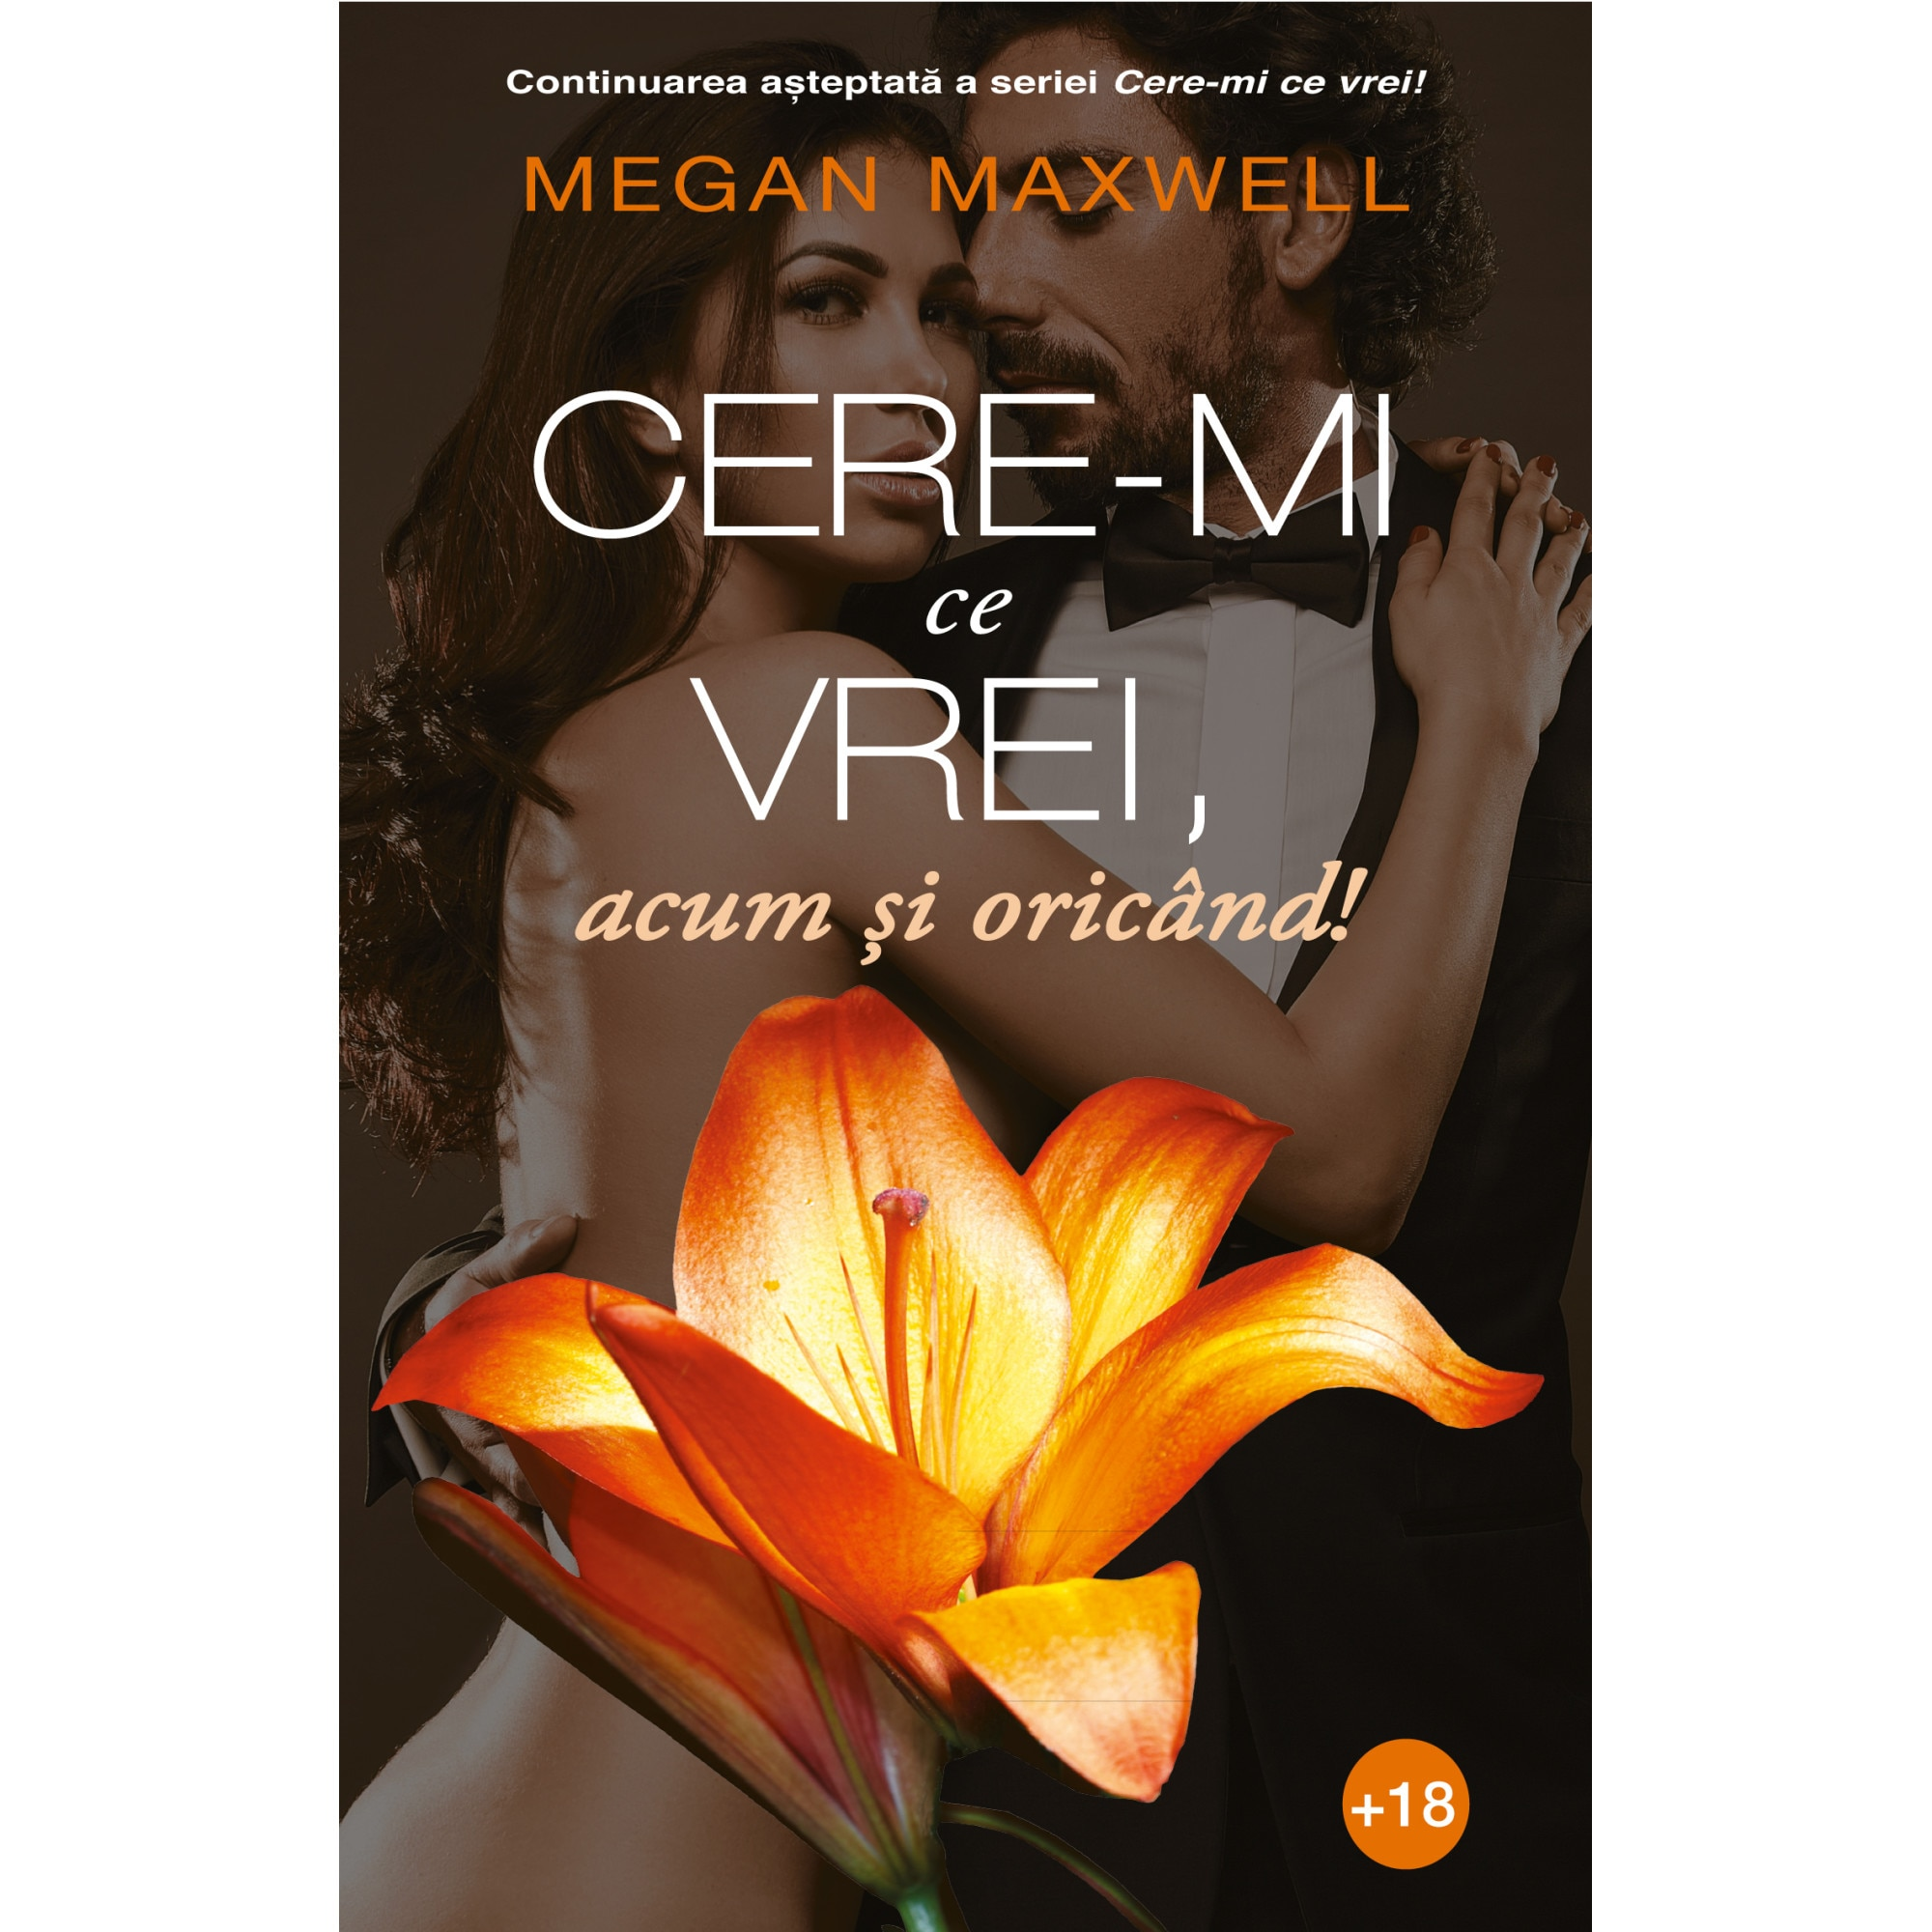 Cere-mi ce vrei, acum si oricand | Megan Maxwell